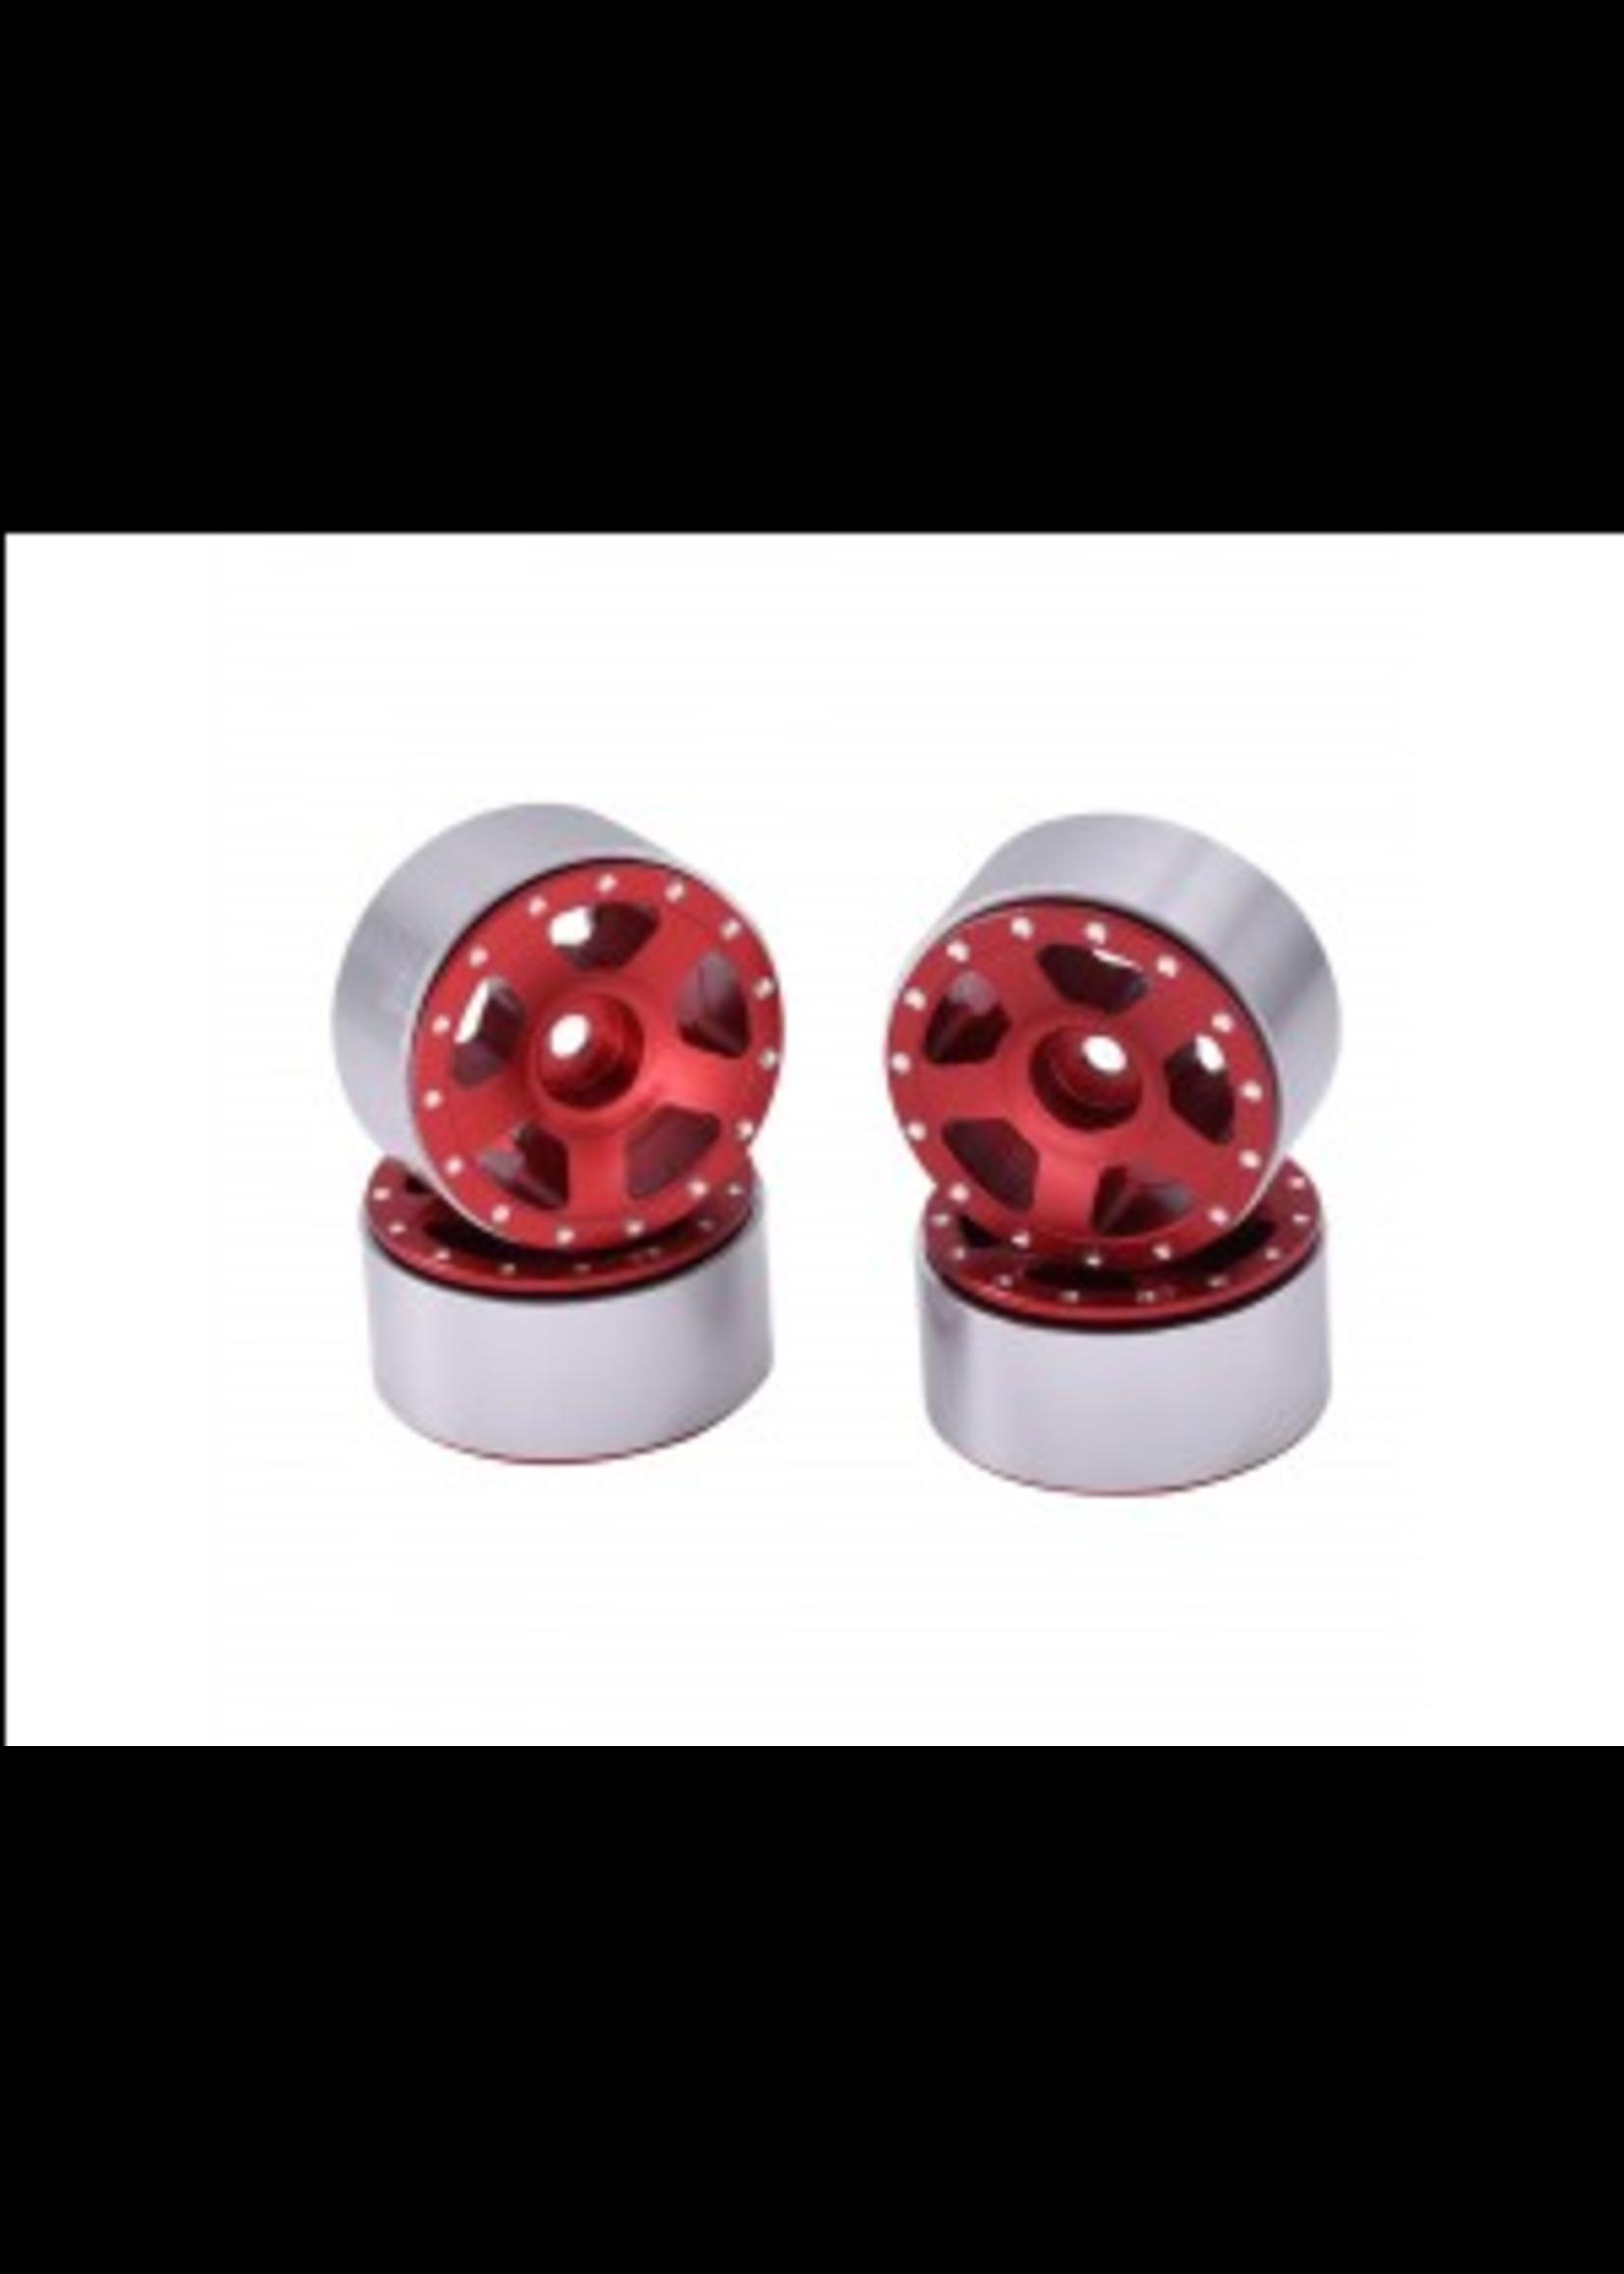 Hobby Details DTSCX24-46A SCX24 Aluminum Starfish Beadlock Wheels, Red